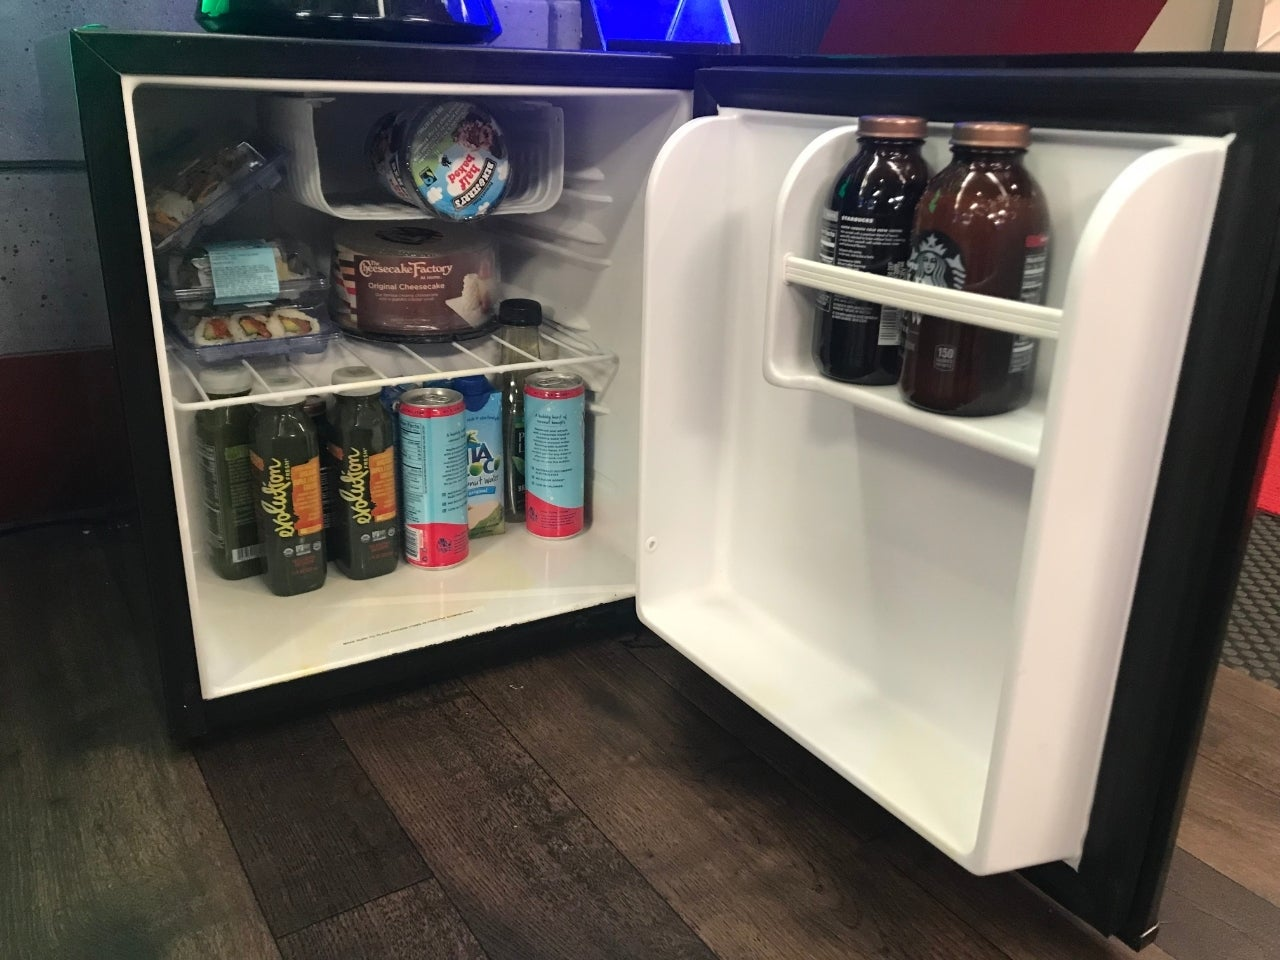 Big Brother Angela fridge